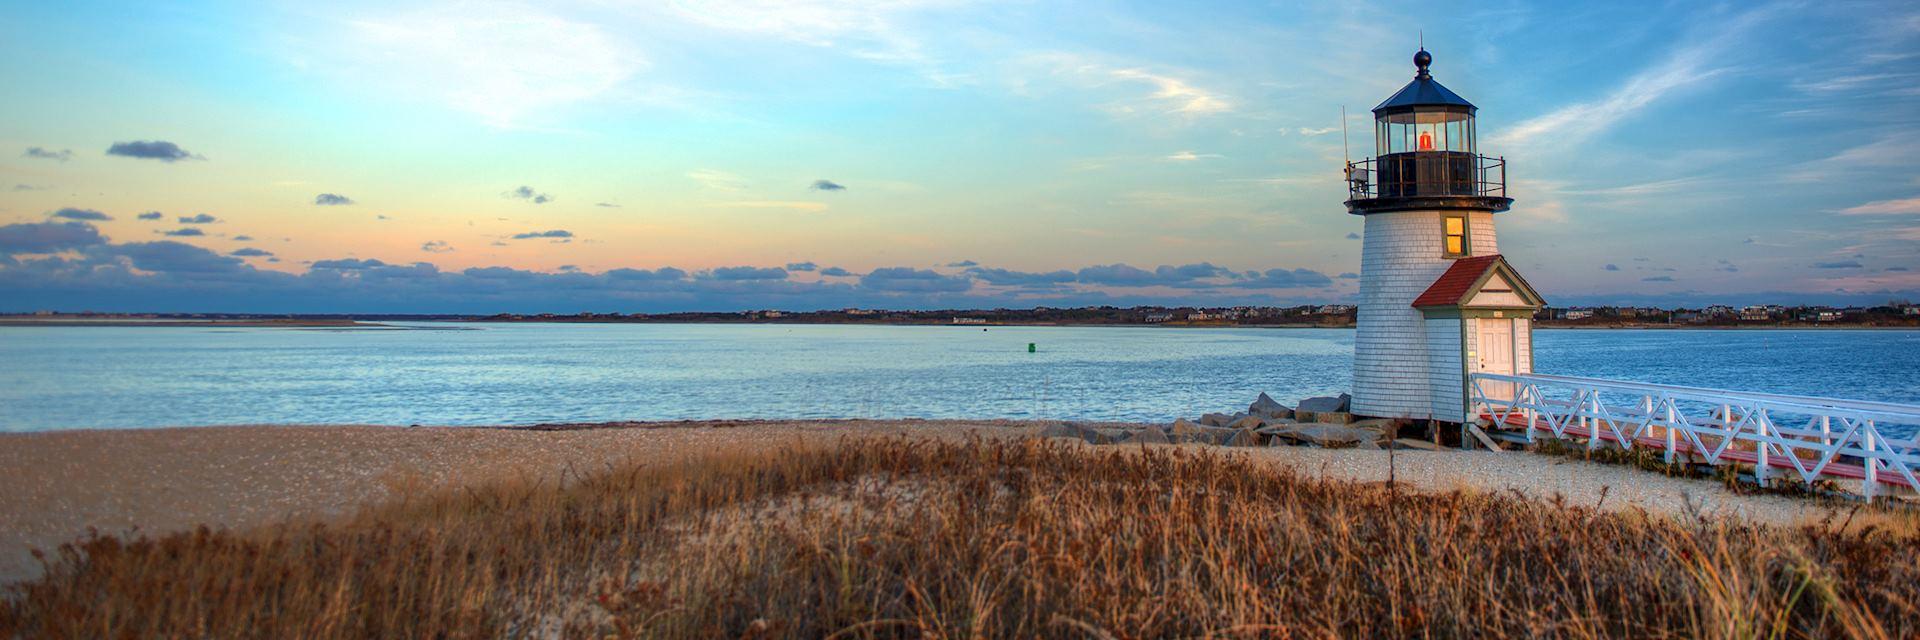 Brant Point Light, Nantucket, New England